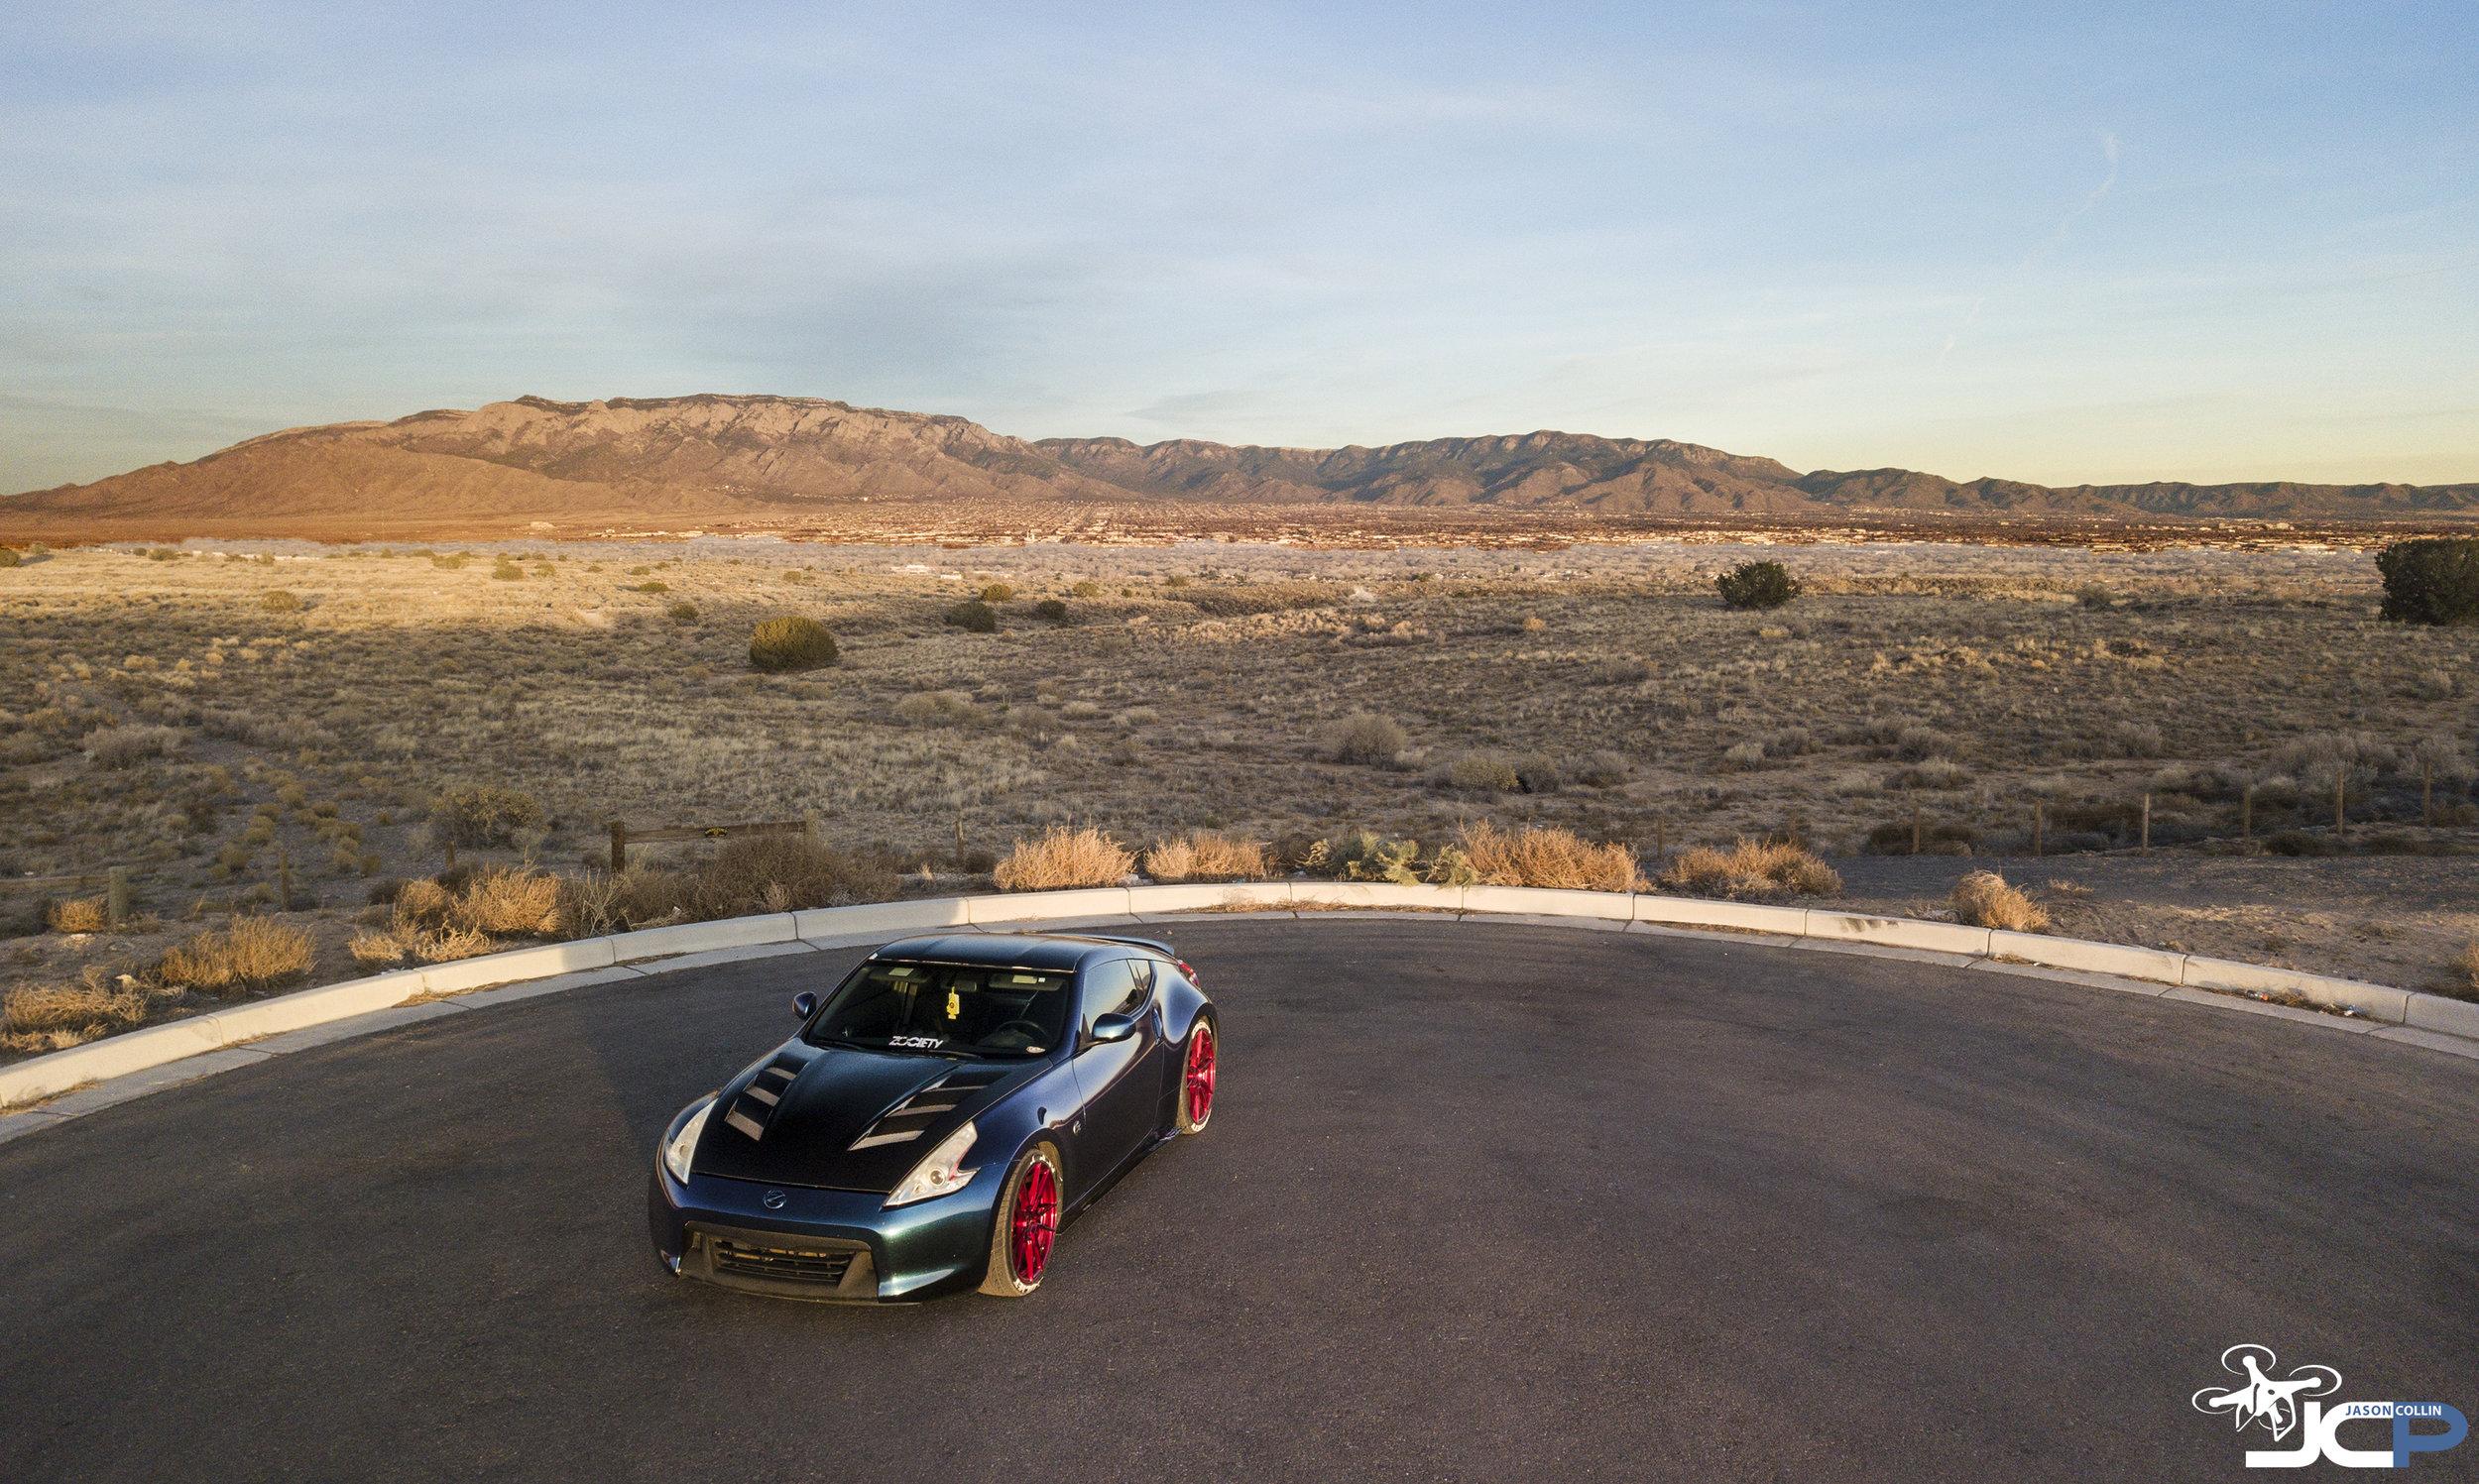 Custom Nissan 370Z in Albuquerque New Mexico - photo made with DJI Mavic Pro drone